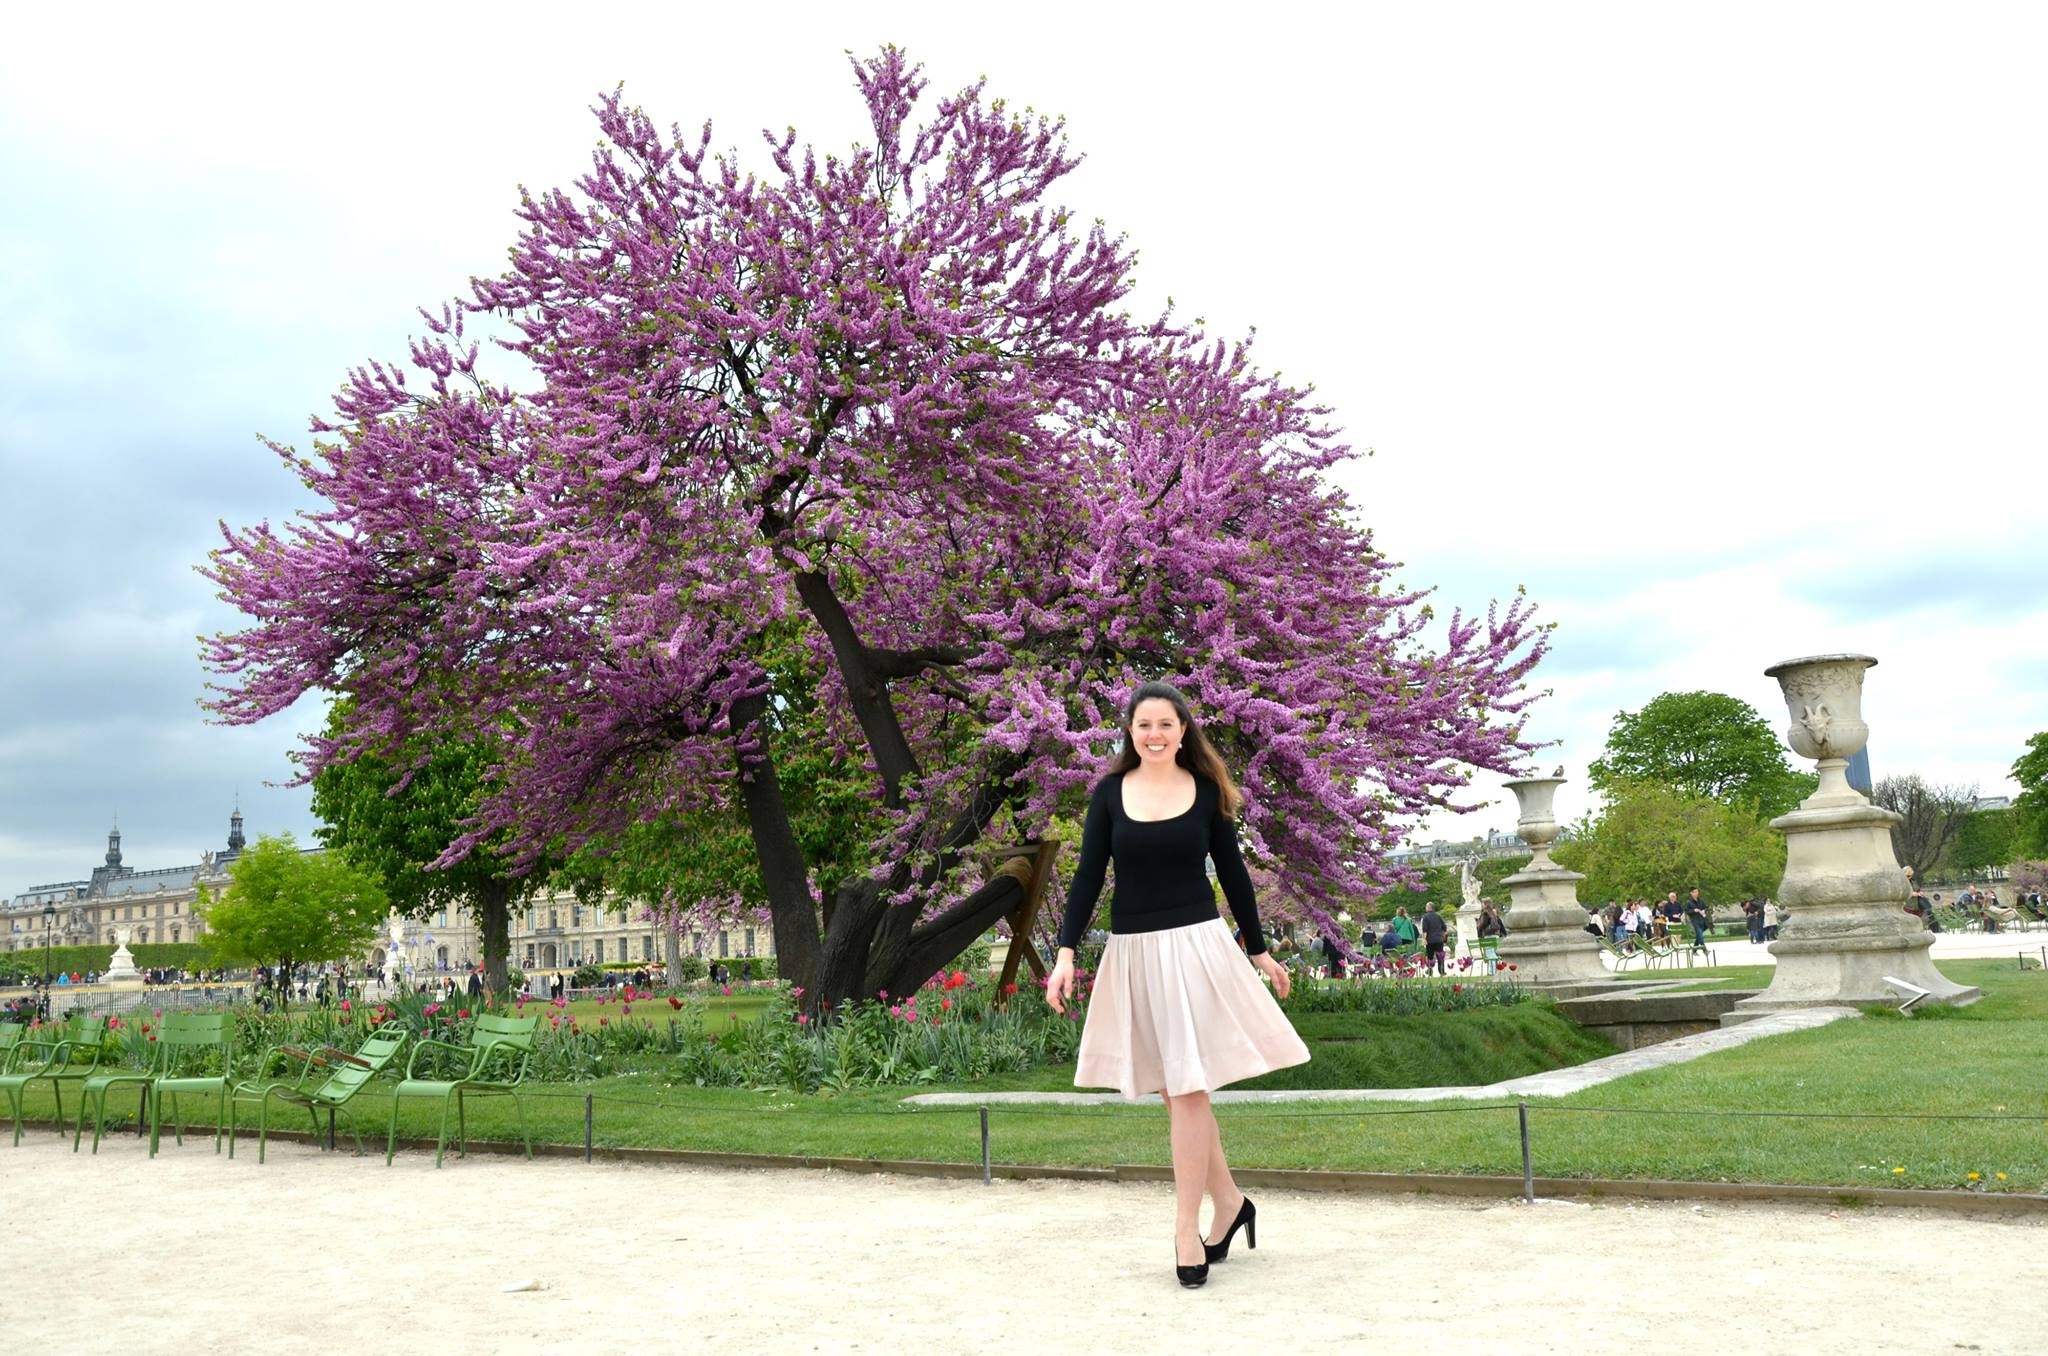 vivere all'estero albero Parigi